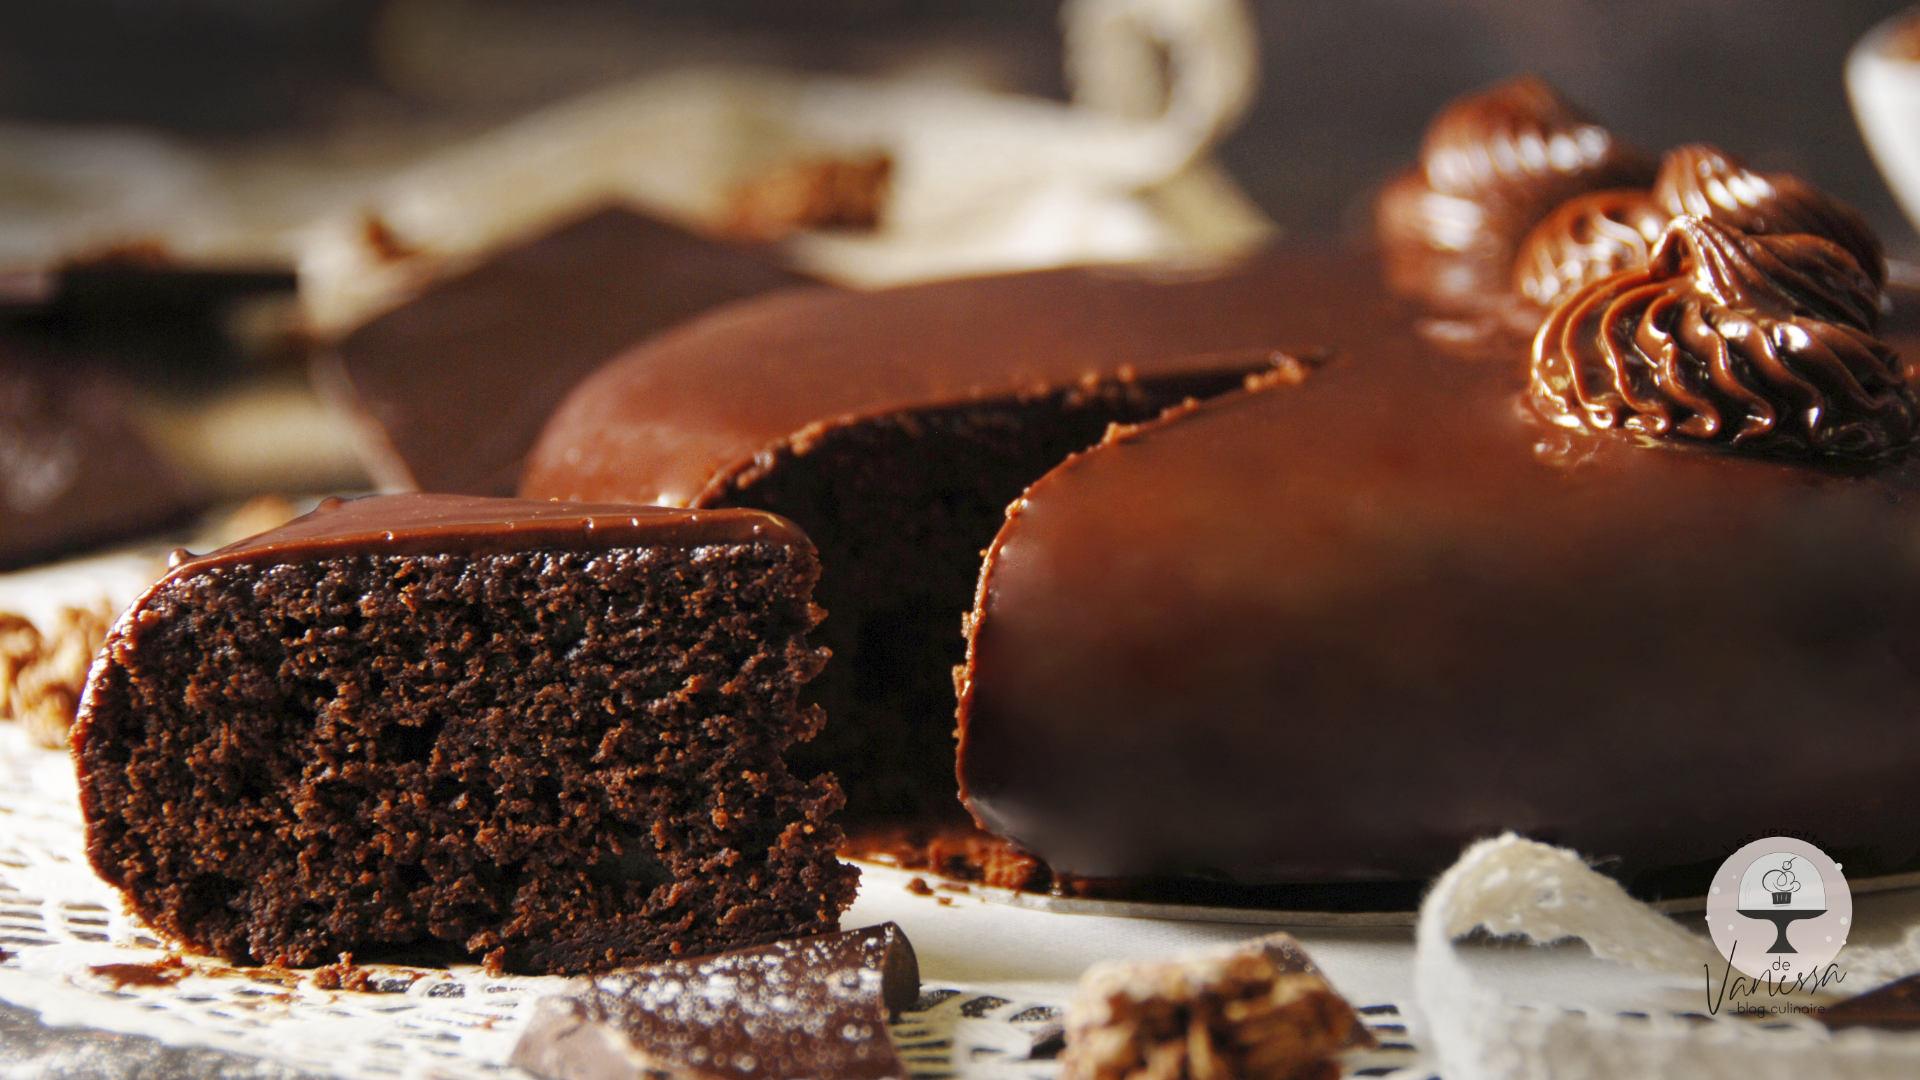 Recette-Gateau-Chocolat-Facile